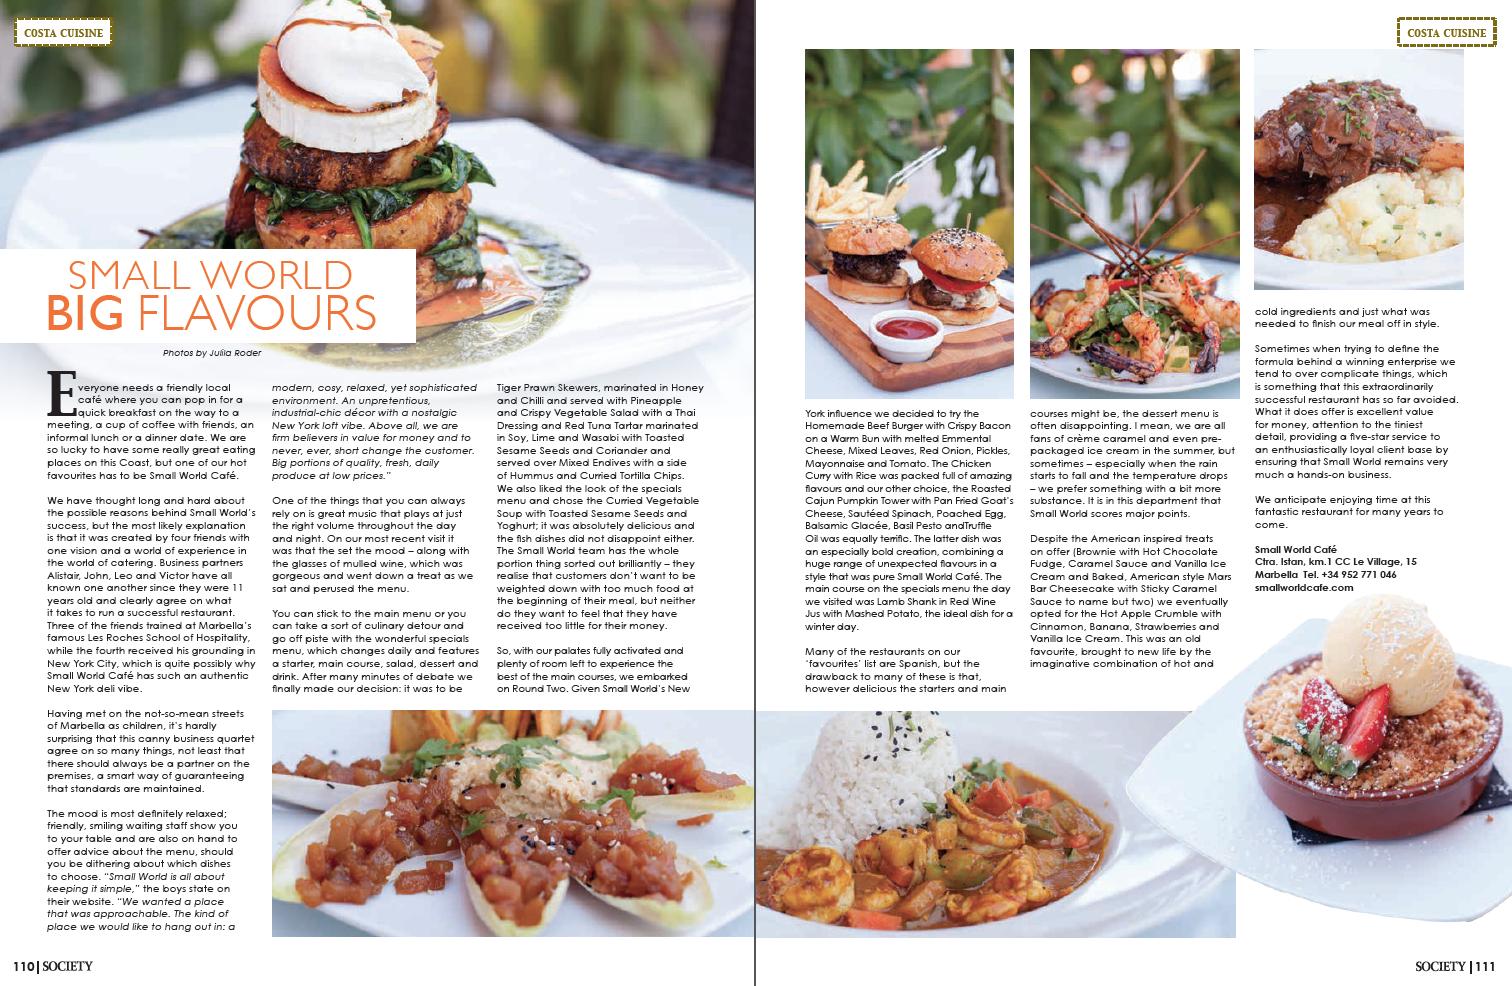 food photography marbella soceity magazine marbella